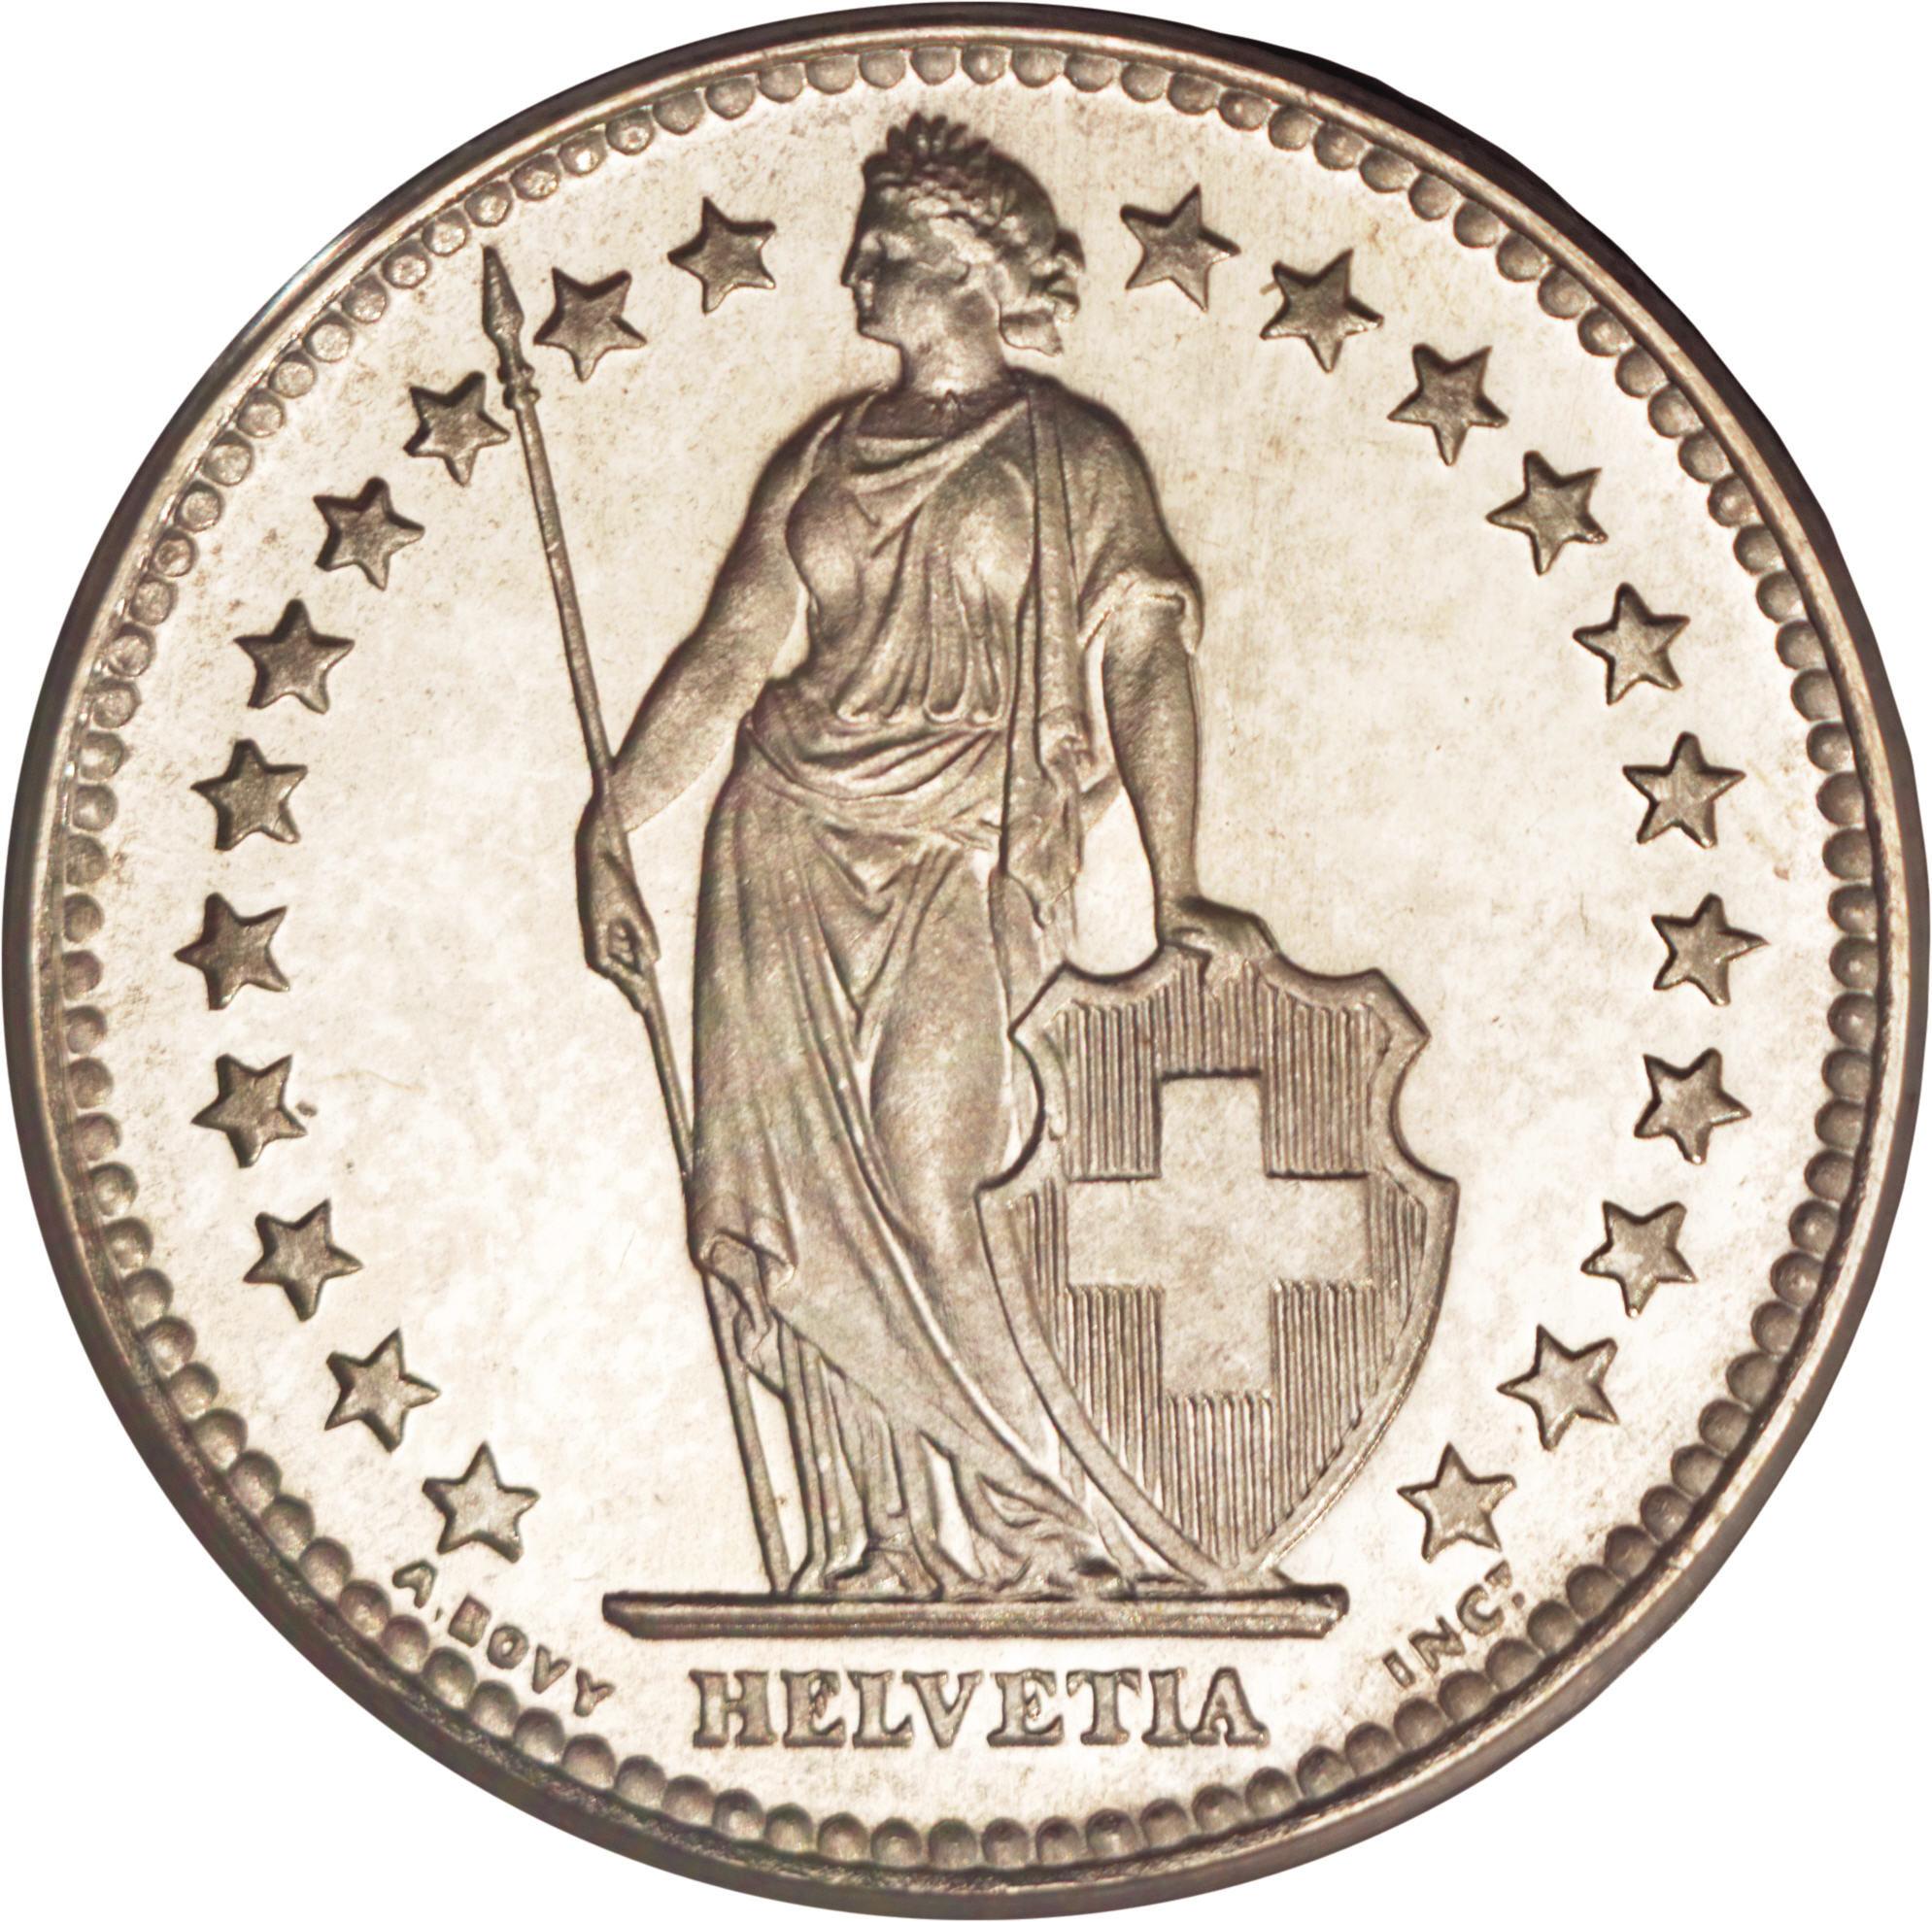 2 Francs - Switzerland – Numista